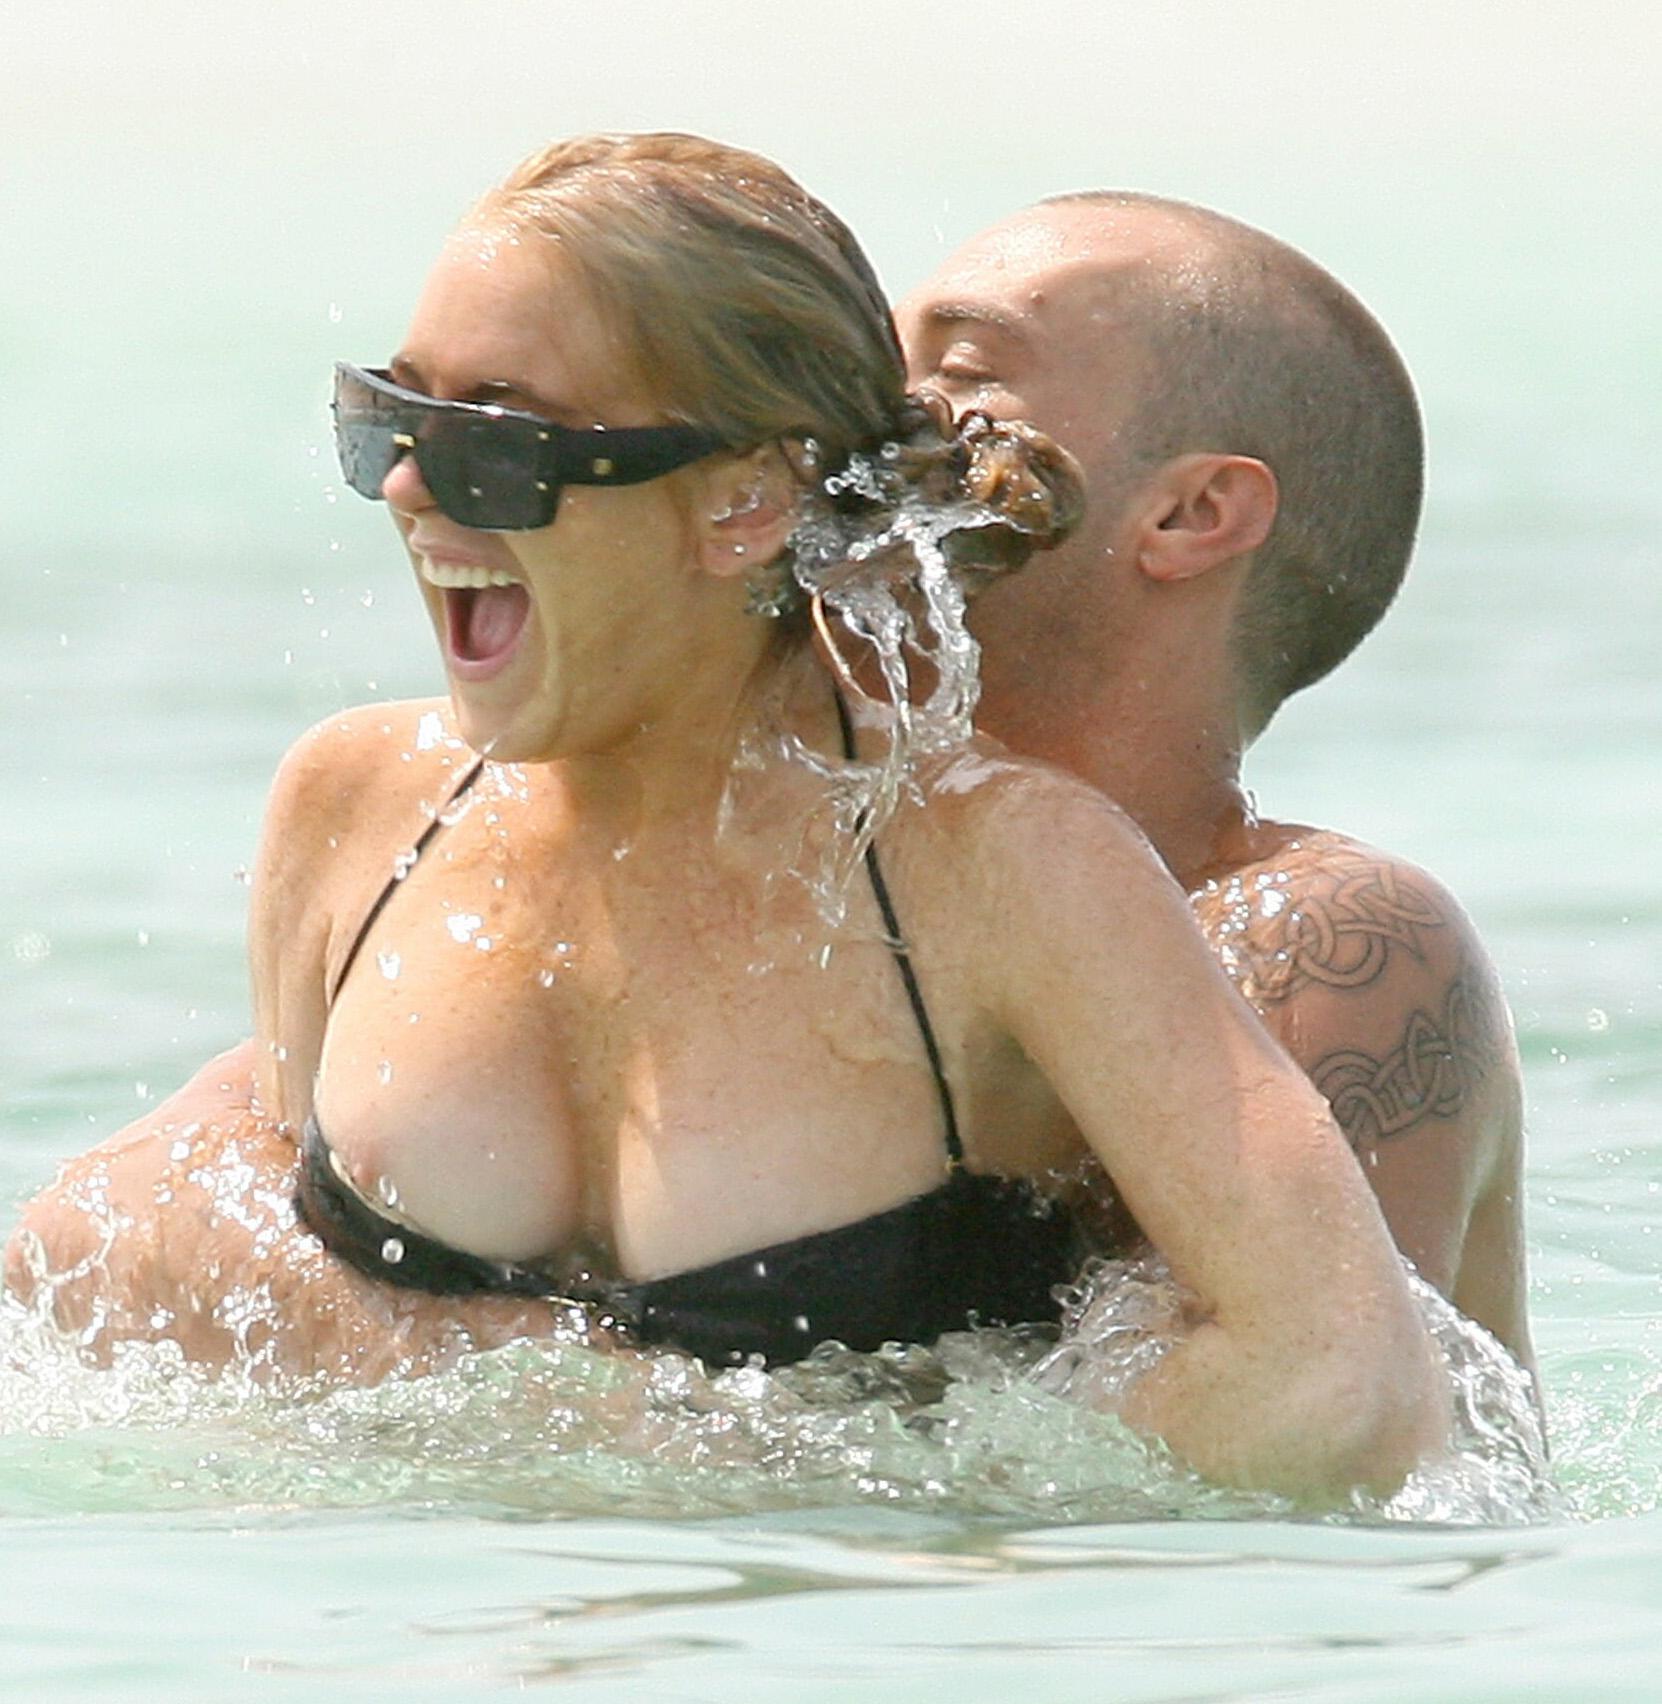 Lindsay Lohan's Boobs Slip Out Of Dress Imageing Liz Dick